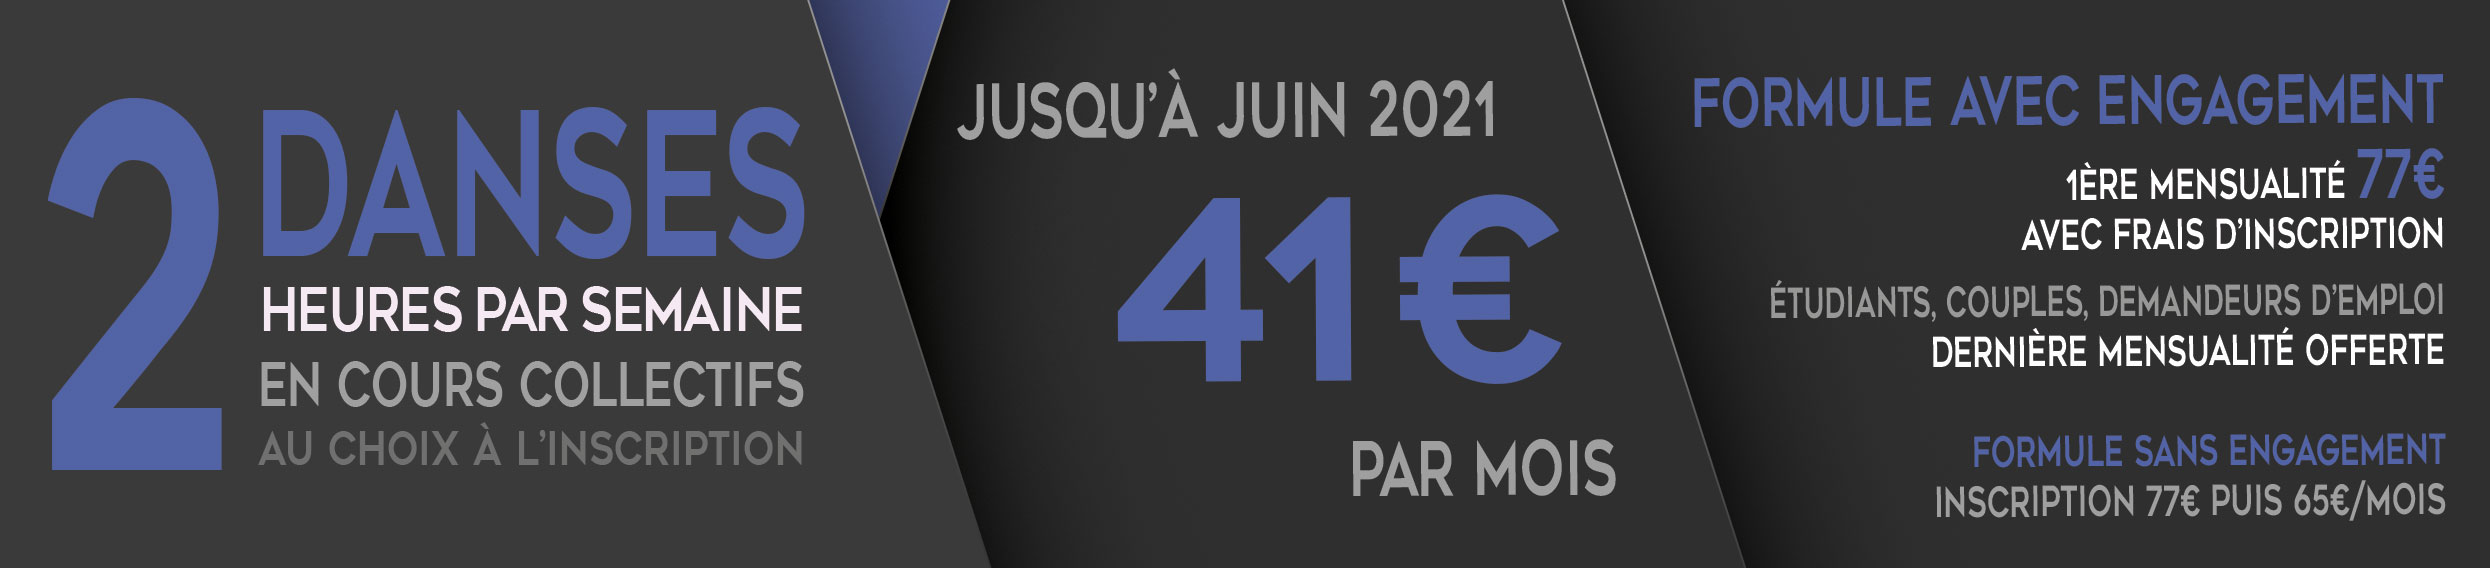 Tarif-2-Cours-Hebdo